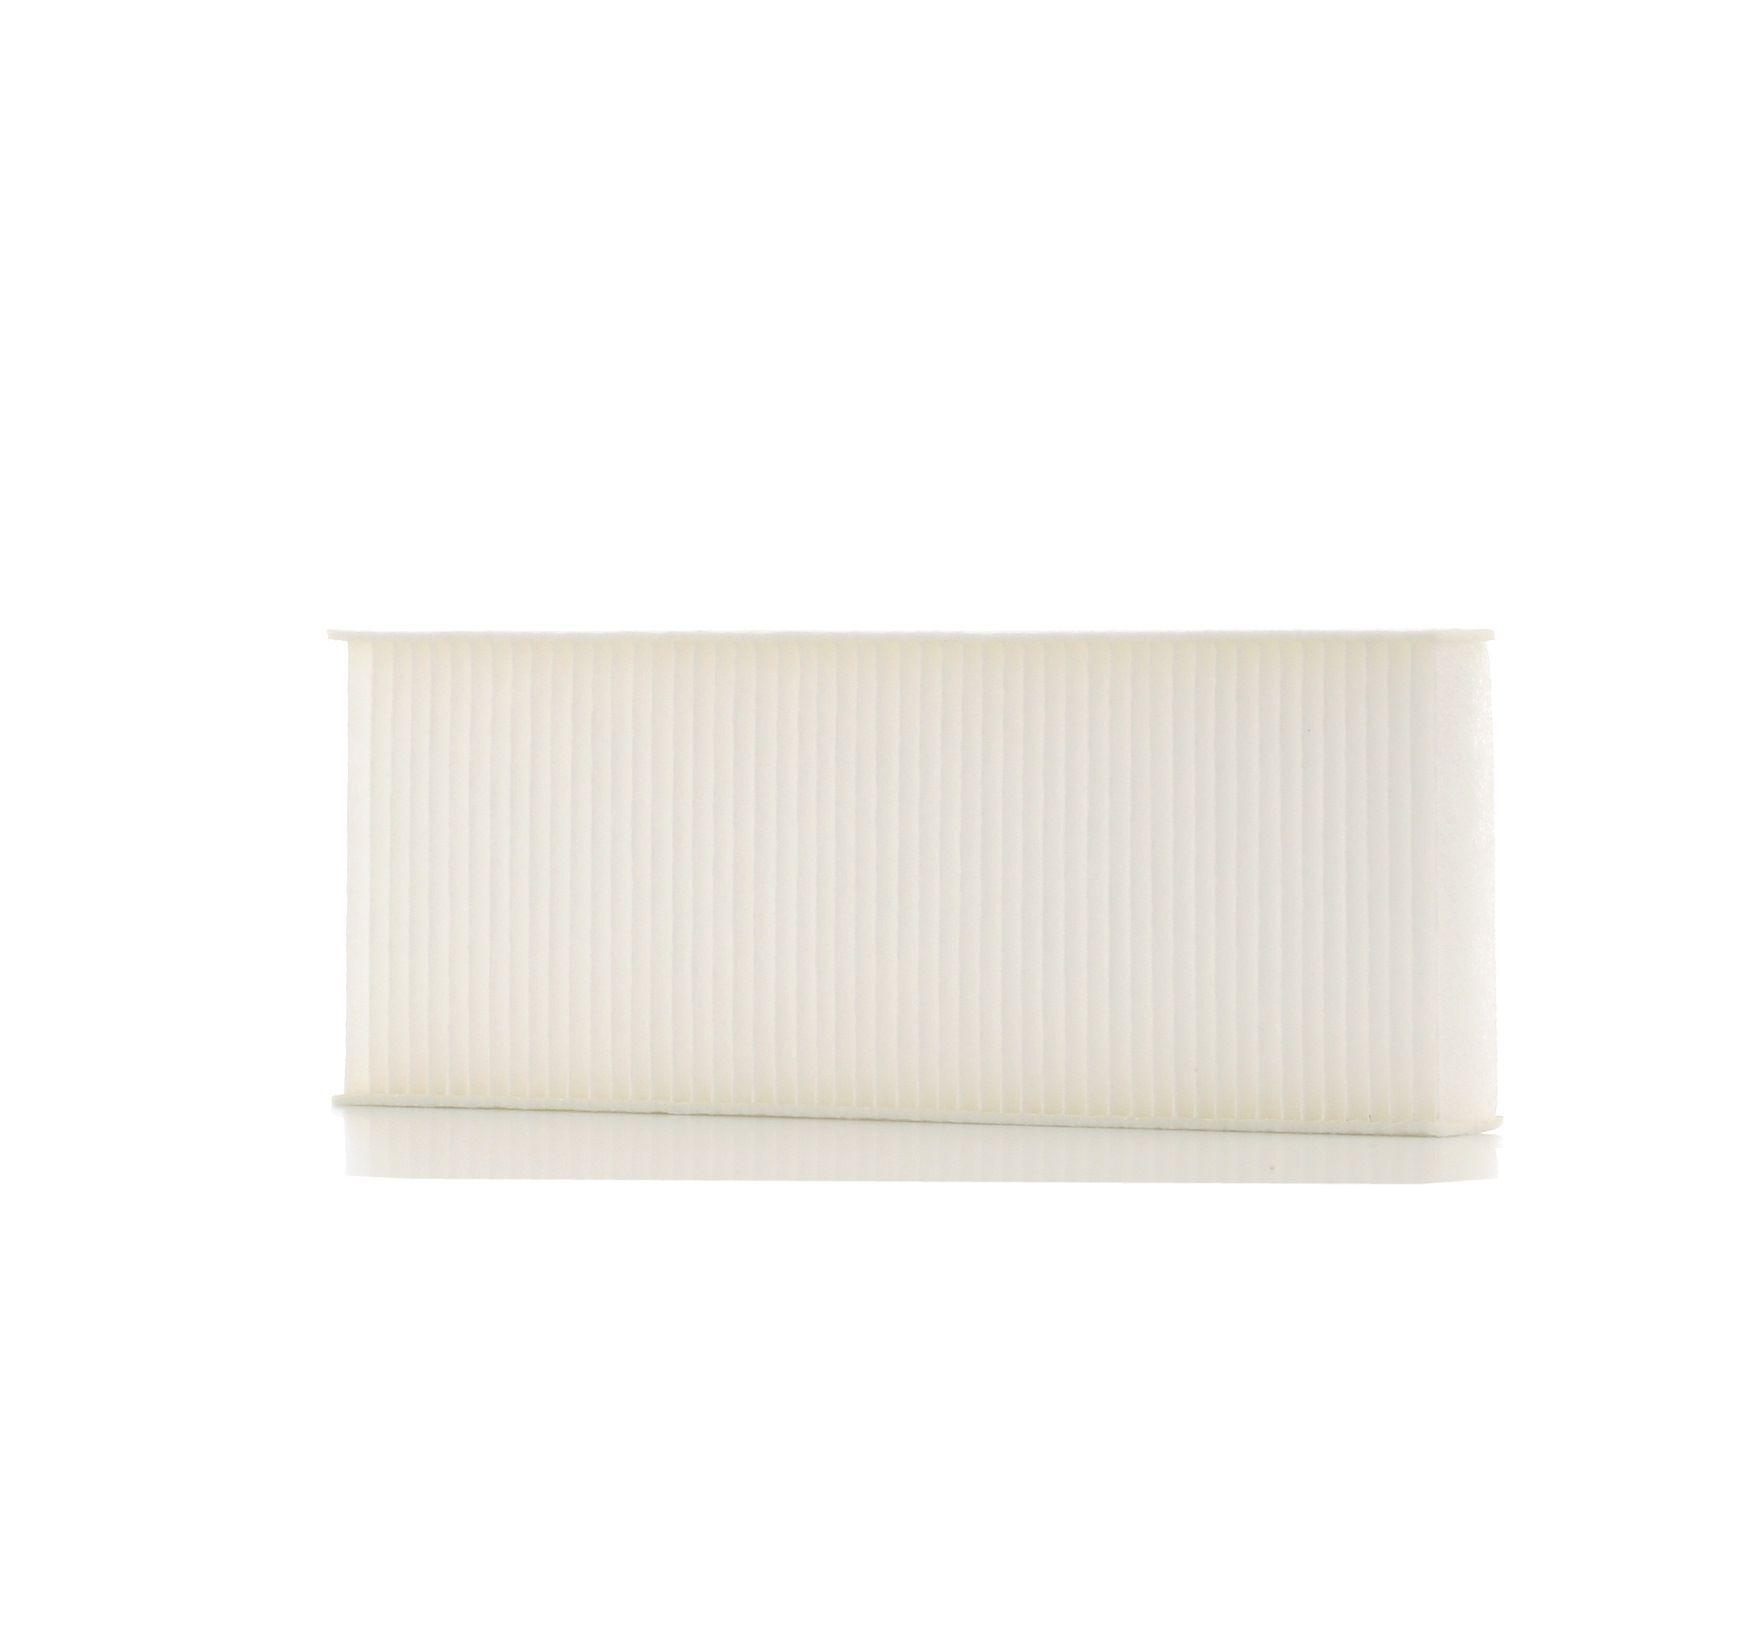 NISSAN PATHFINDER 2021 Pollenfilter - Original MAHLE ORIGINAL LA 289 Breite: 100, 100,0mm, Höhe: 25mm, Länge: 264mm